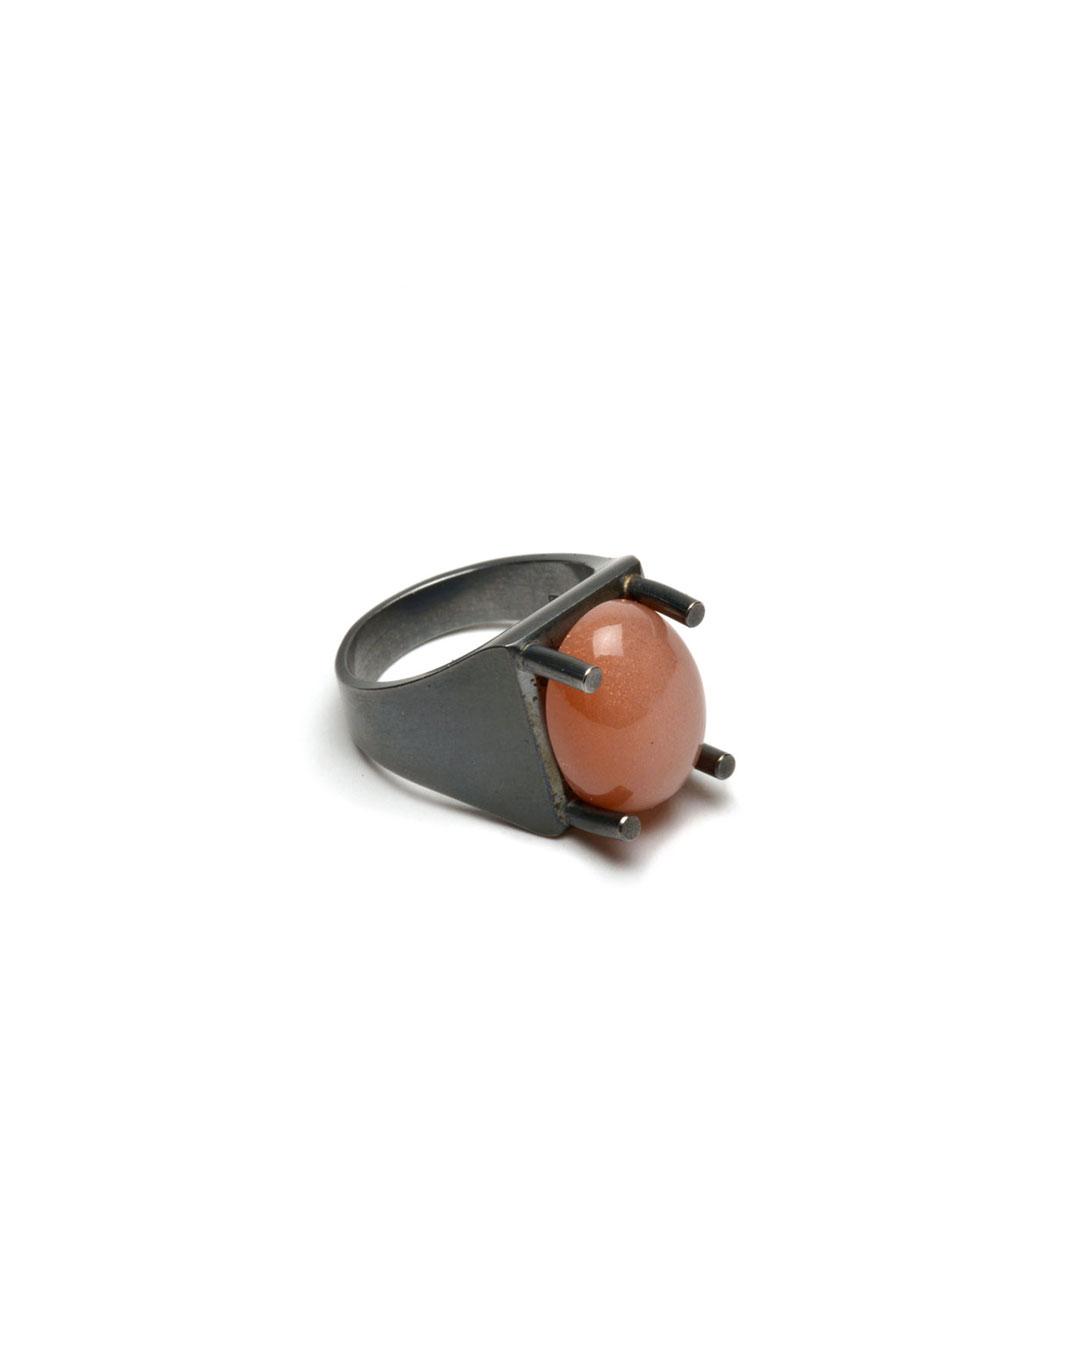 Ute Eitzenhöfer, untitled, 2014, ring; silver, moonstone, 30 x 20 x 15 mm, €500